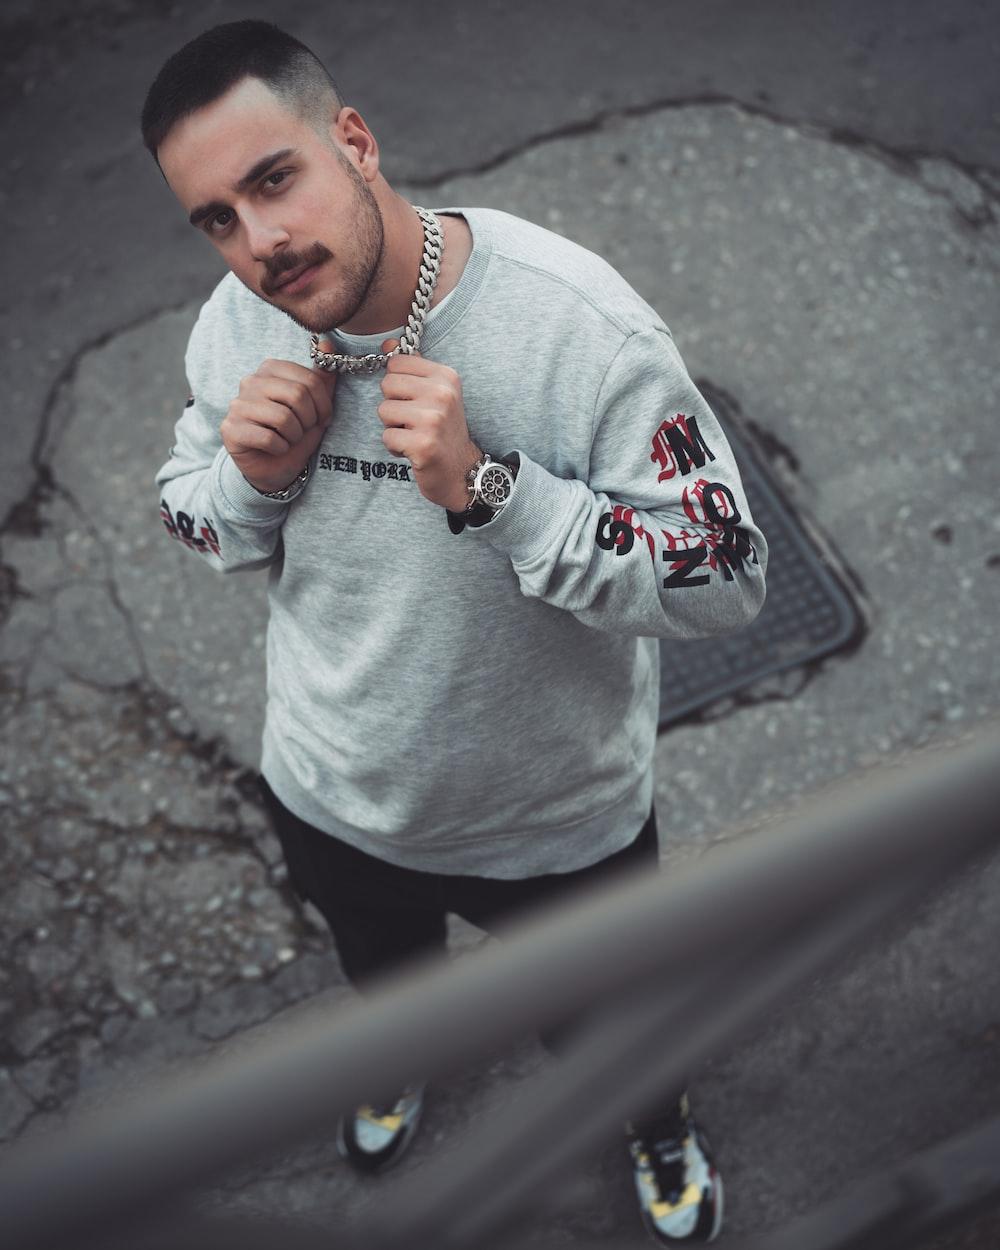 man wearing gray sweatshirt